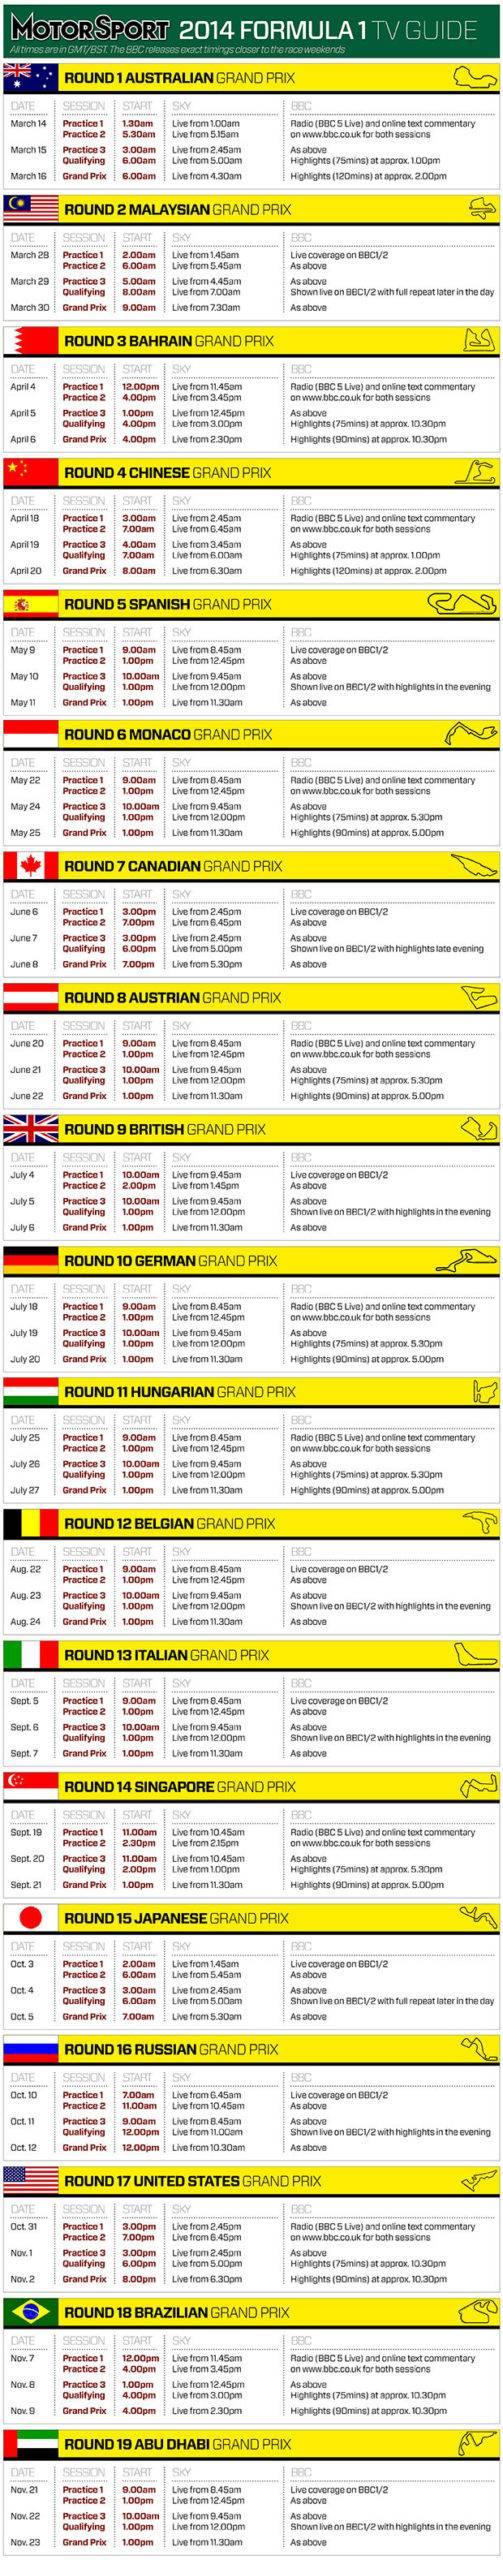 2014 Formula 1 viewing guide